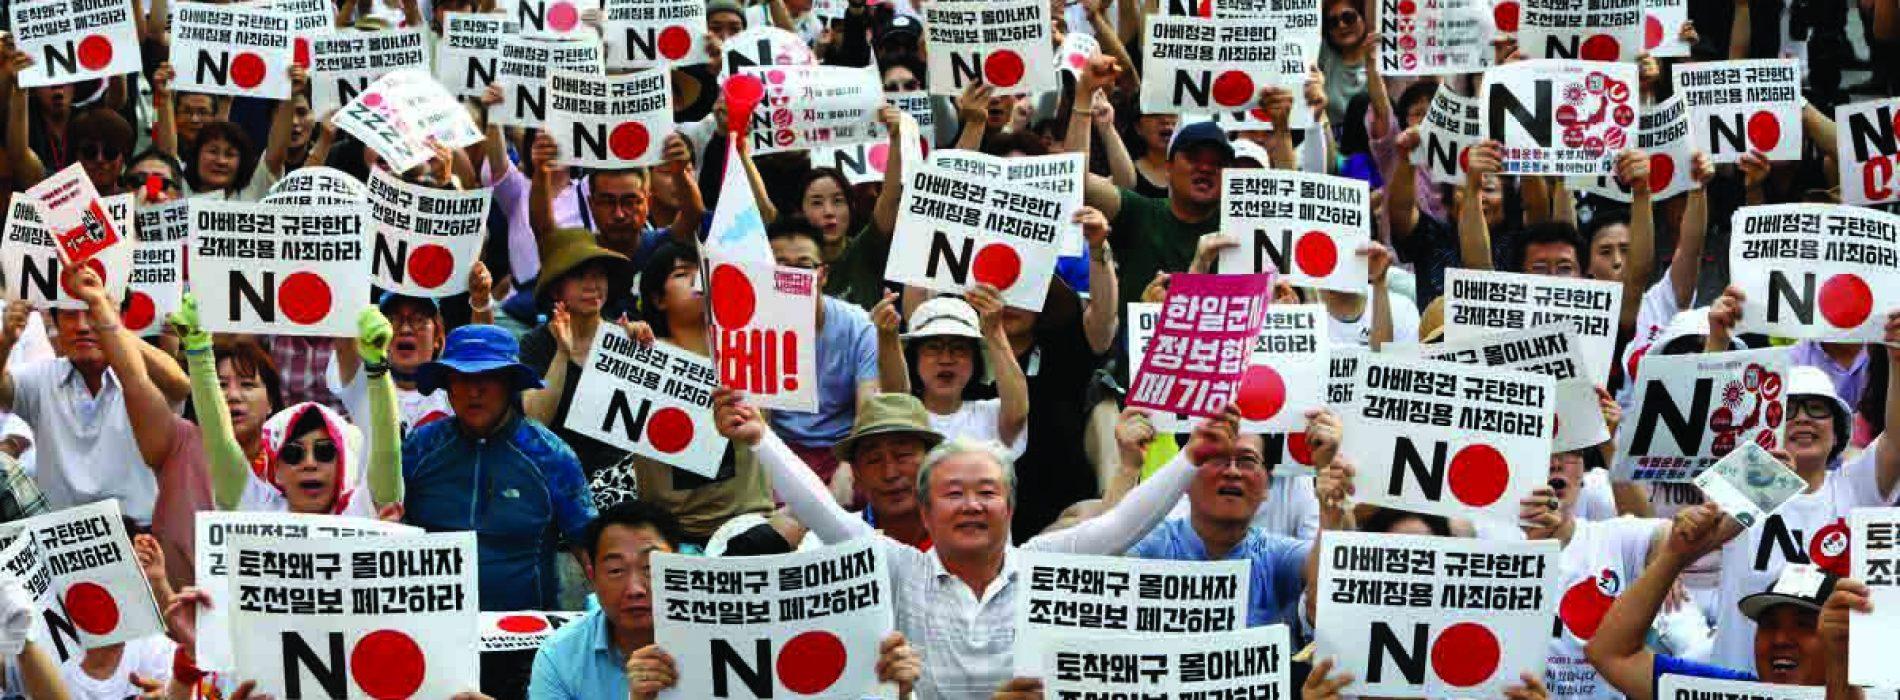 Korea and Japan: the history wars